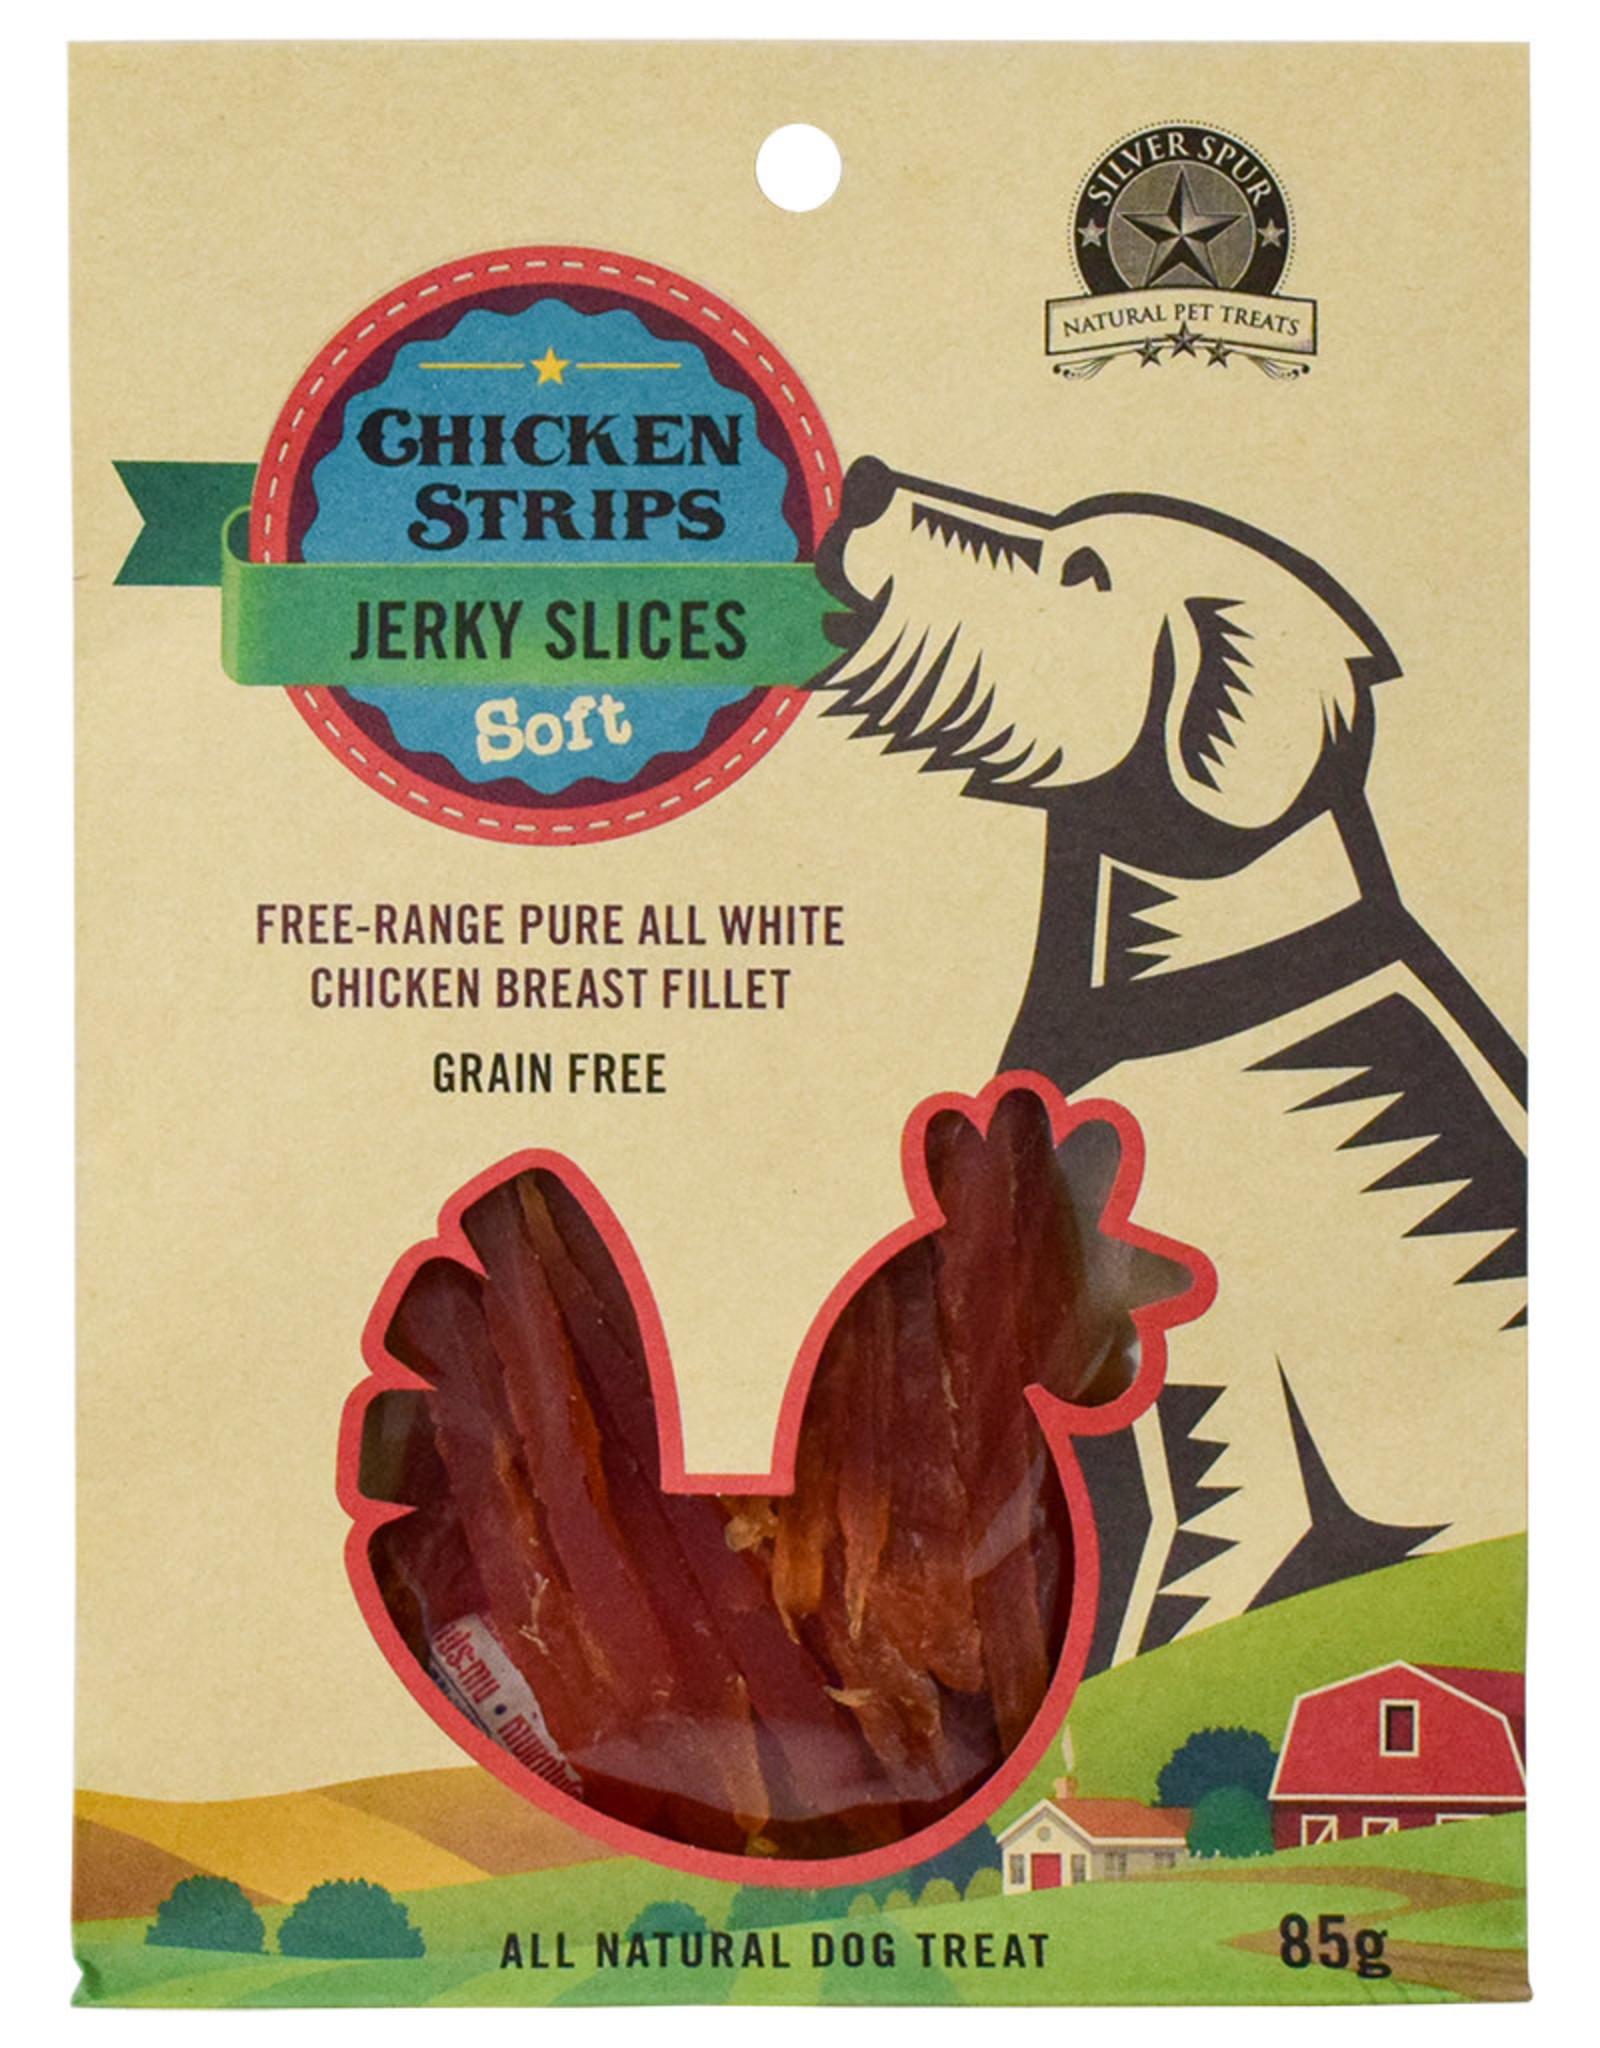 Silver Spur Chicken Strip Jerky Slices SOFT